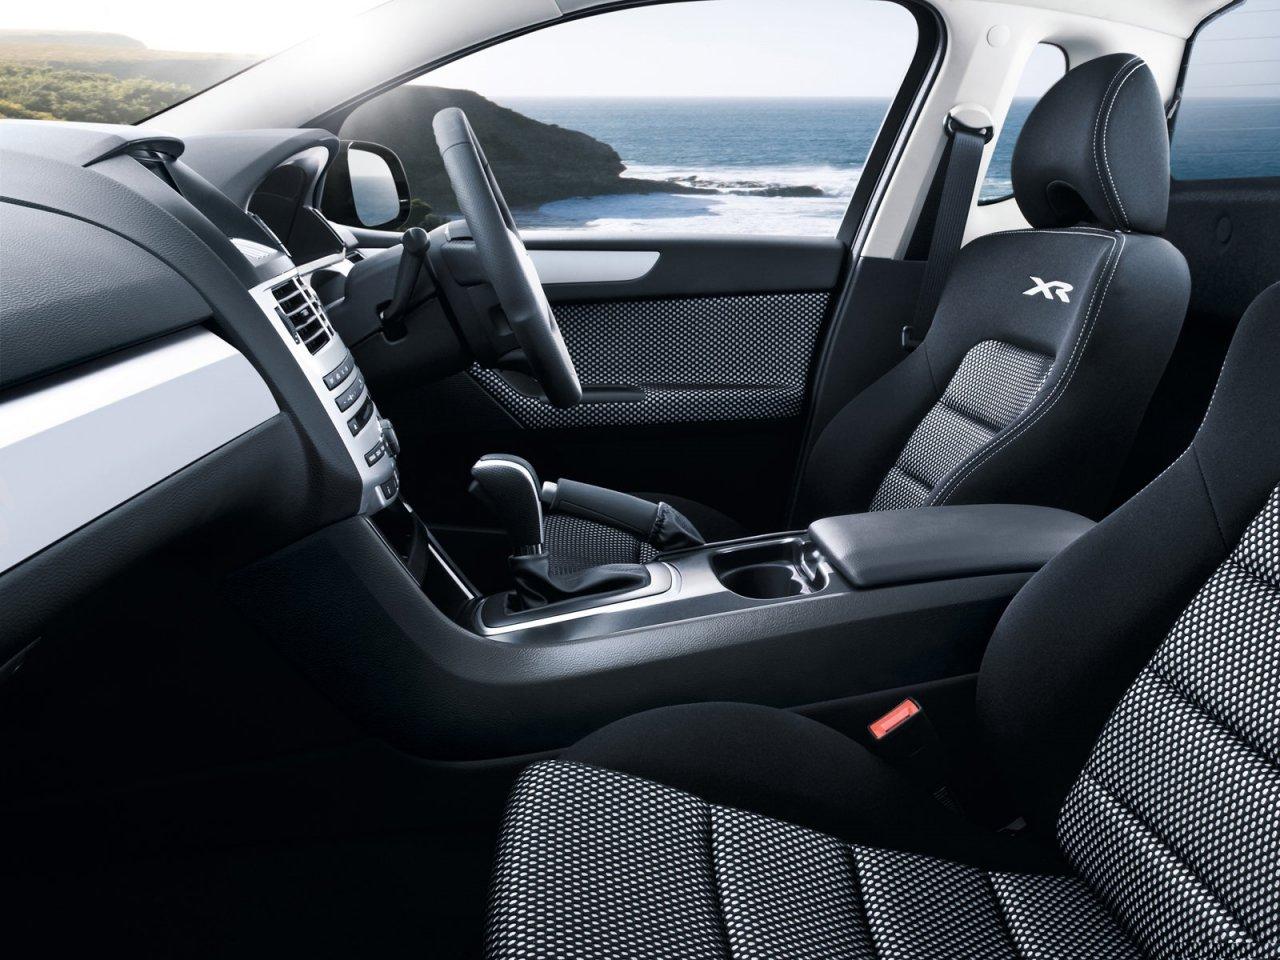 Ford FG Falcon XR6 Ute laptimes, specs, performance data